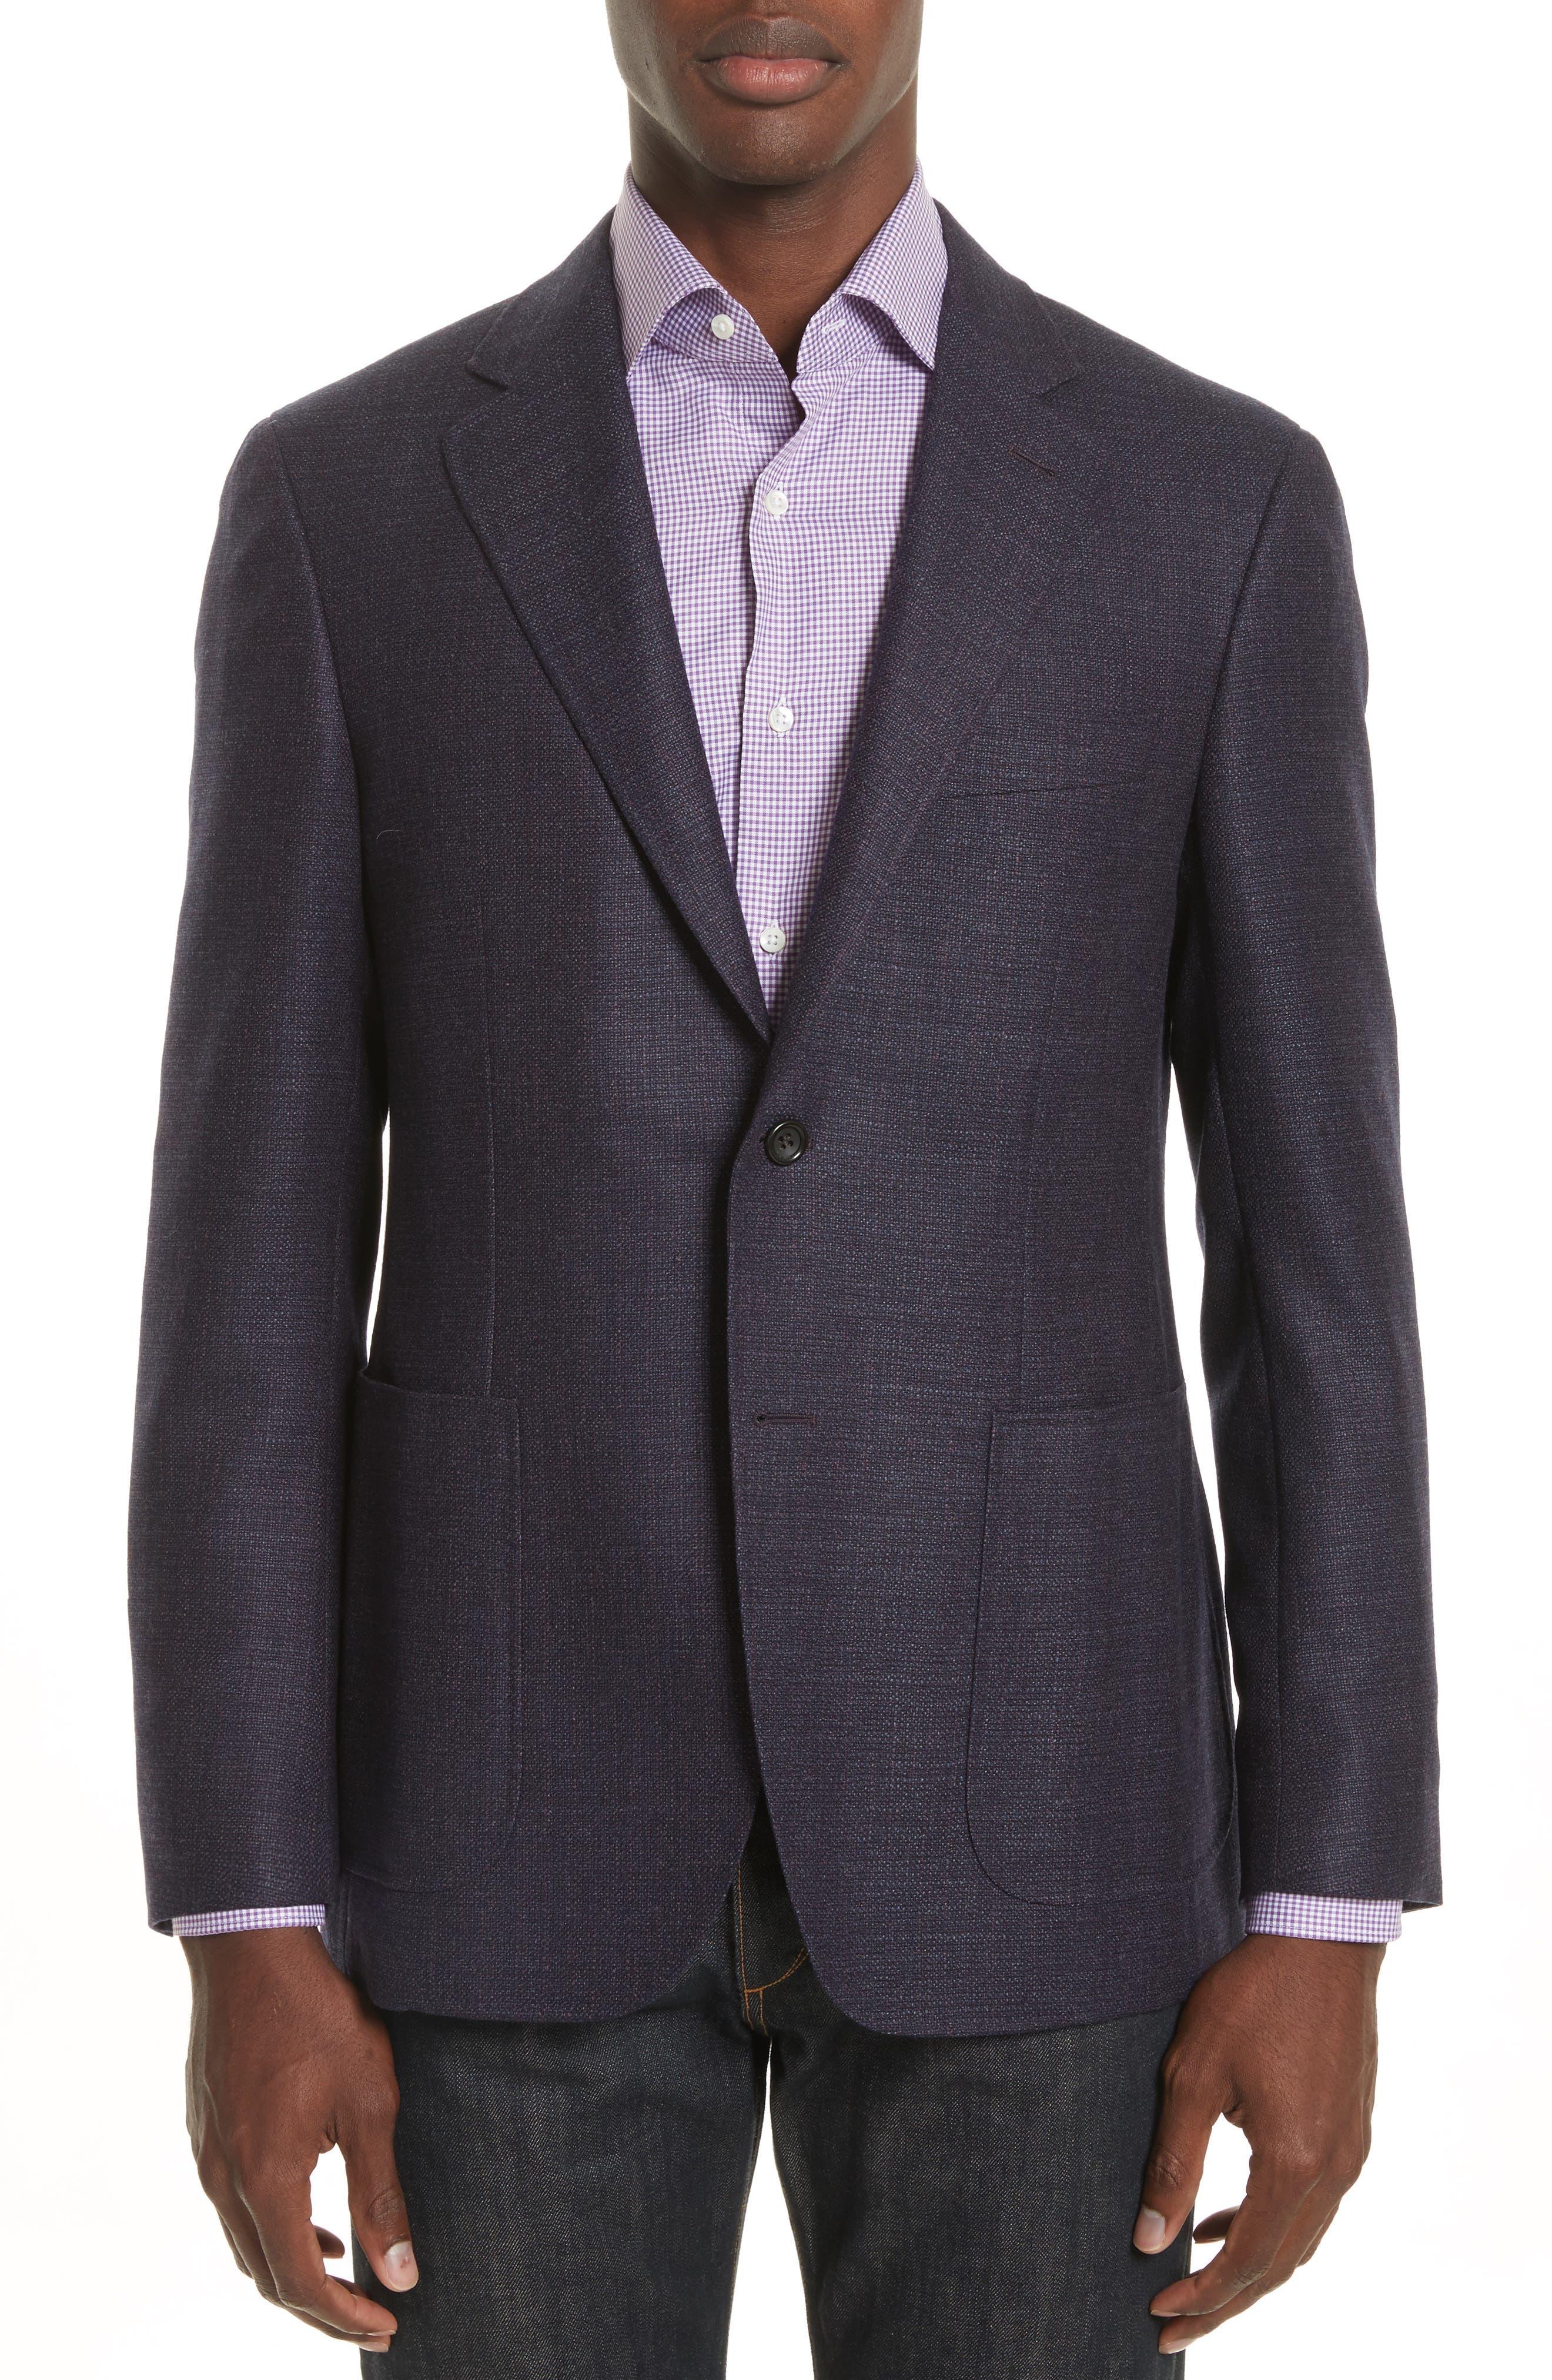 Main Image - Canali Kei Coat Classic Fit Wool Blazer